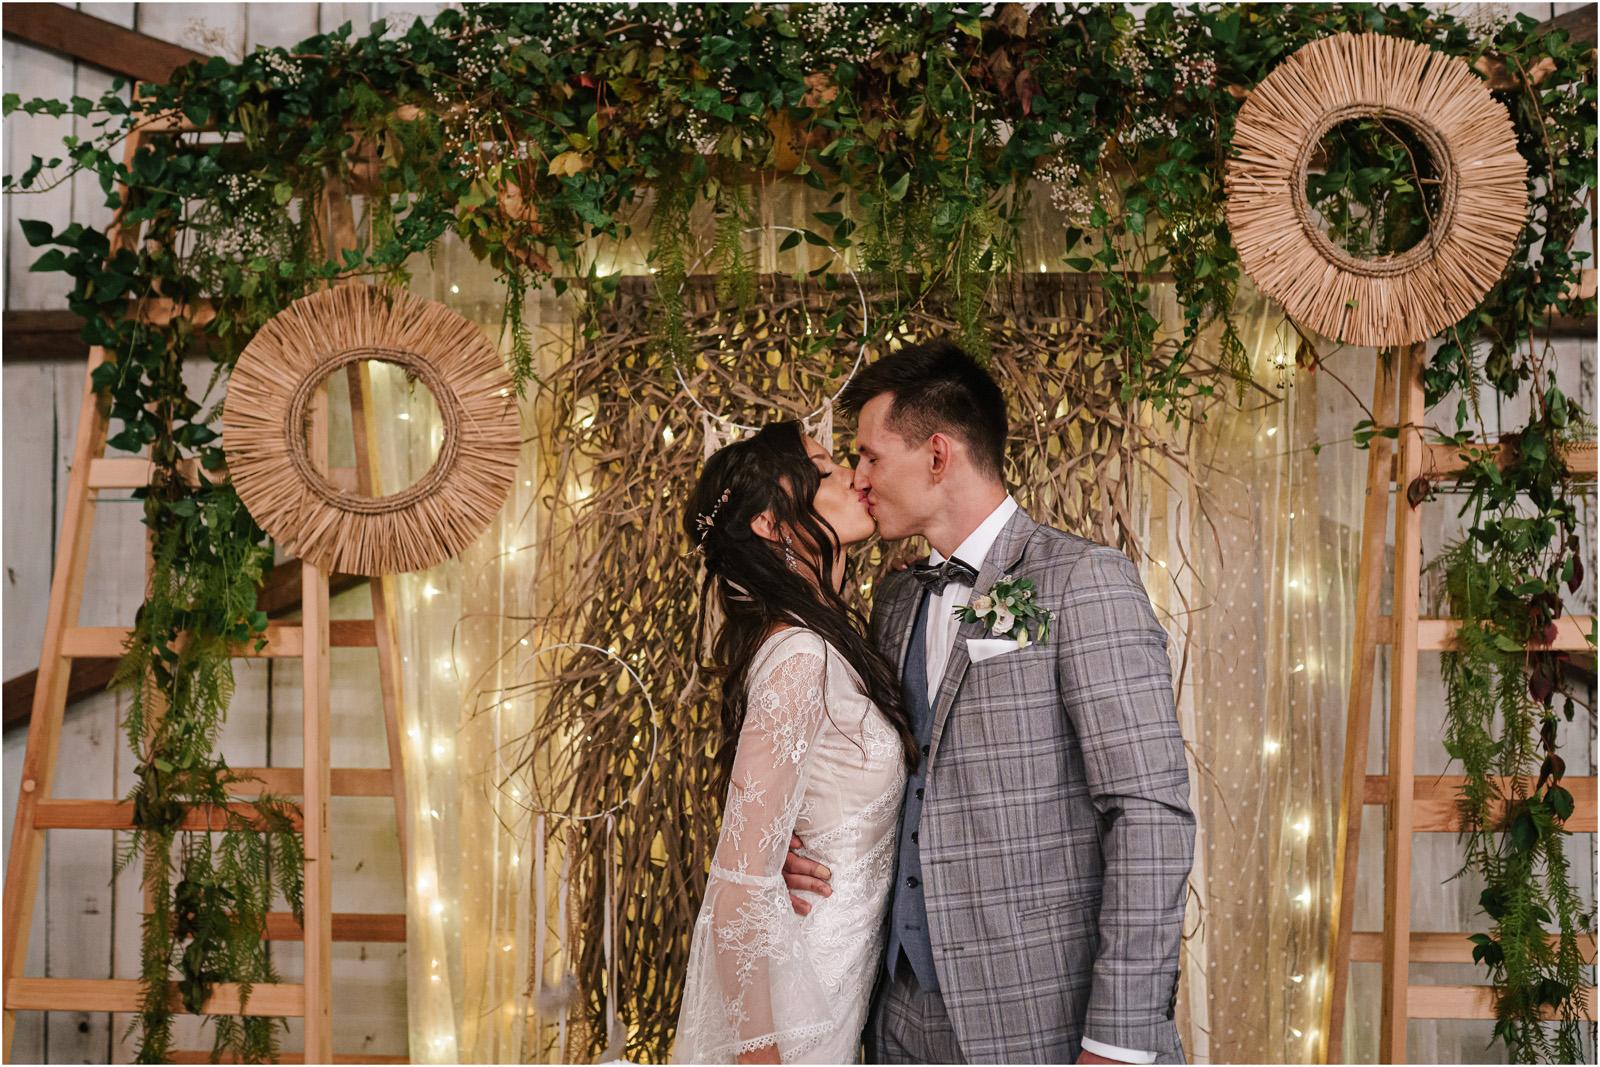 Ania & Mateusz | boho wesele w Stodole pod Kasztanami 83